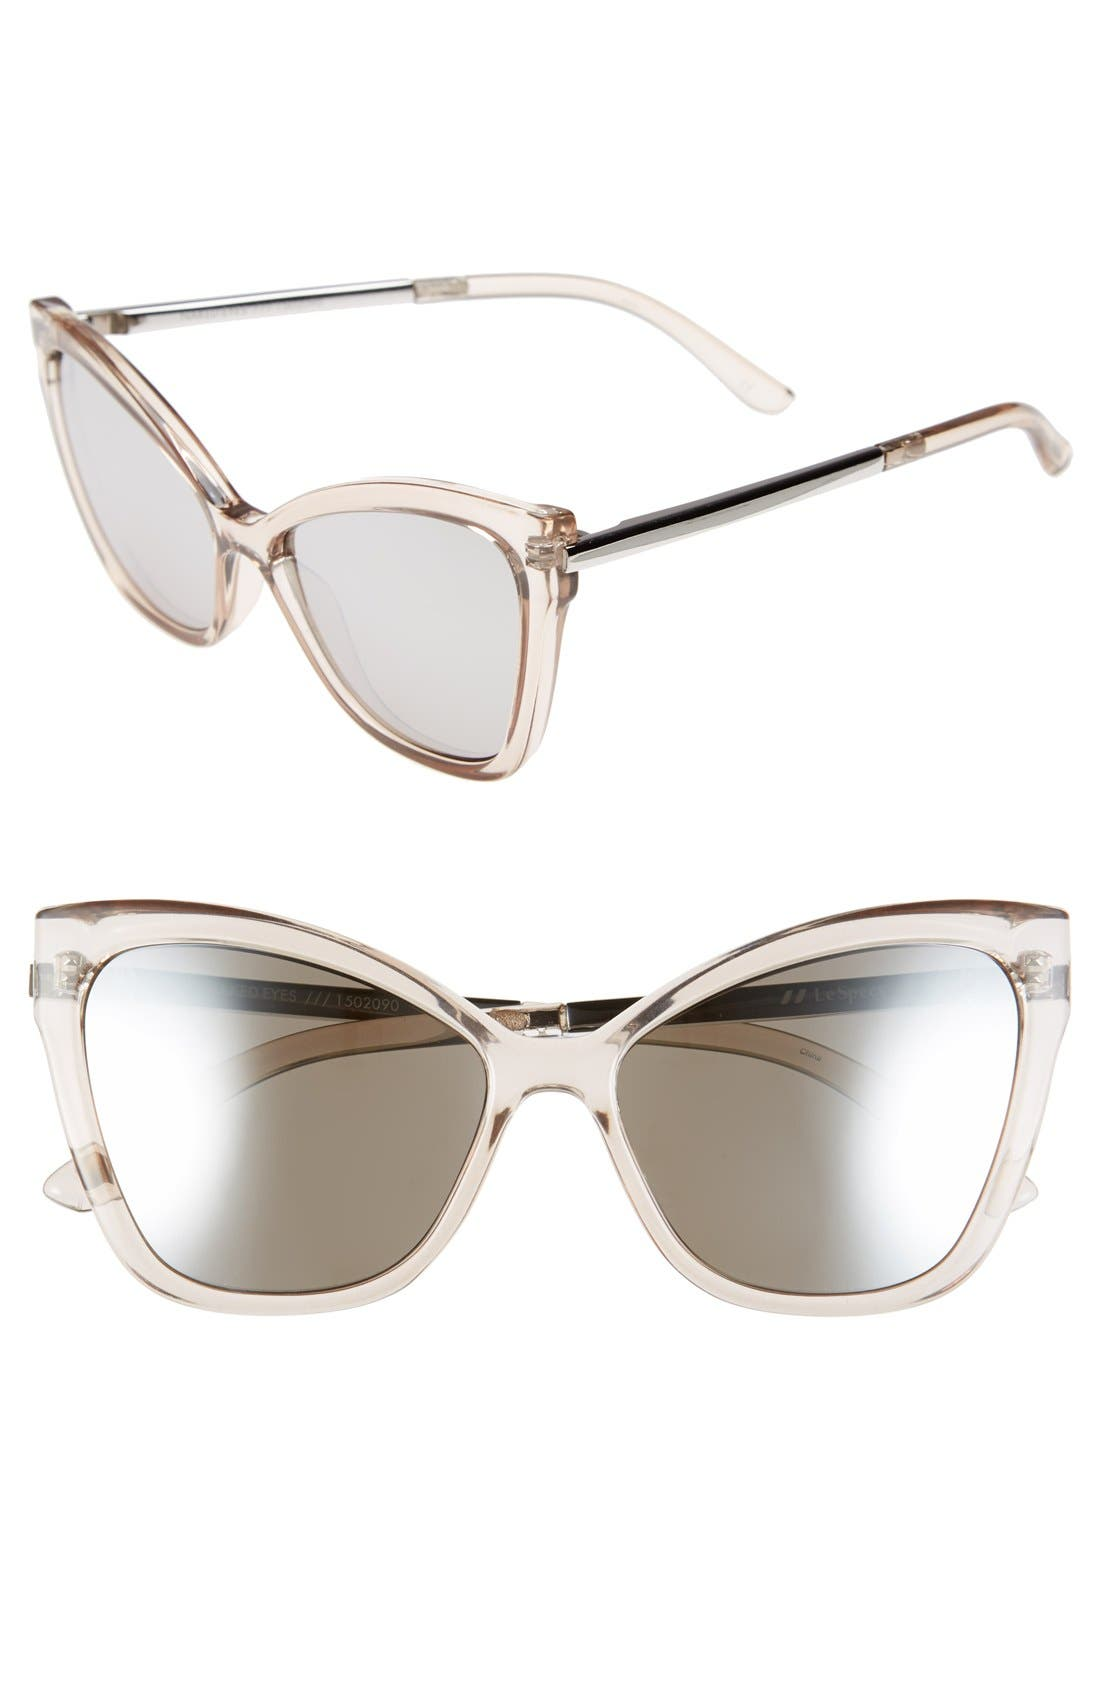 LE SPECS,                             'Naked Eyes' 56mm Cat Eye Sunglasses,                             Main thumbnail 1, color,                             020